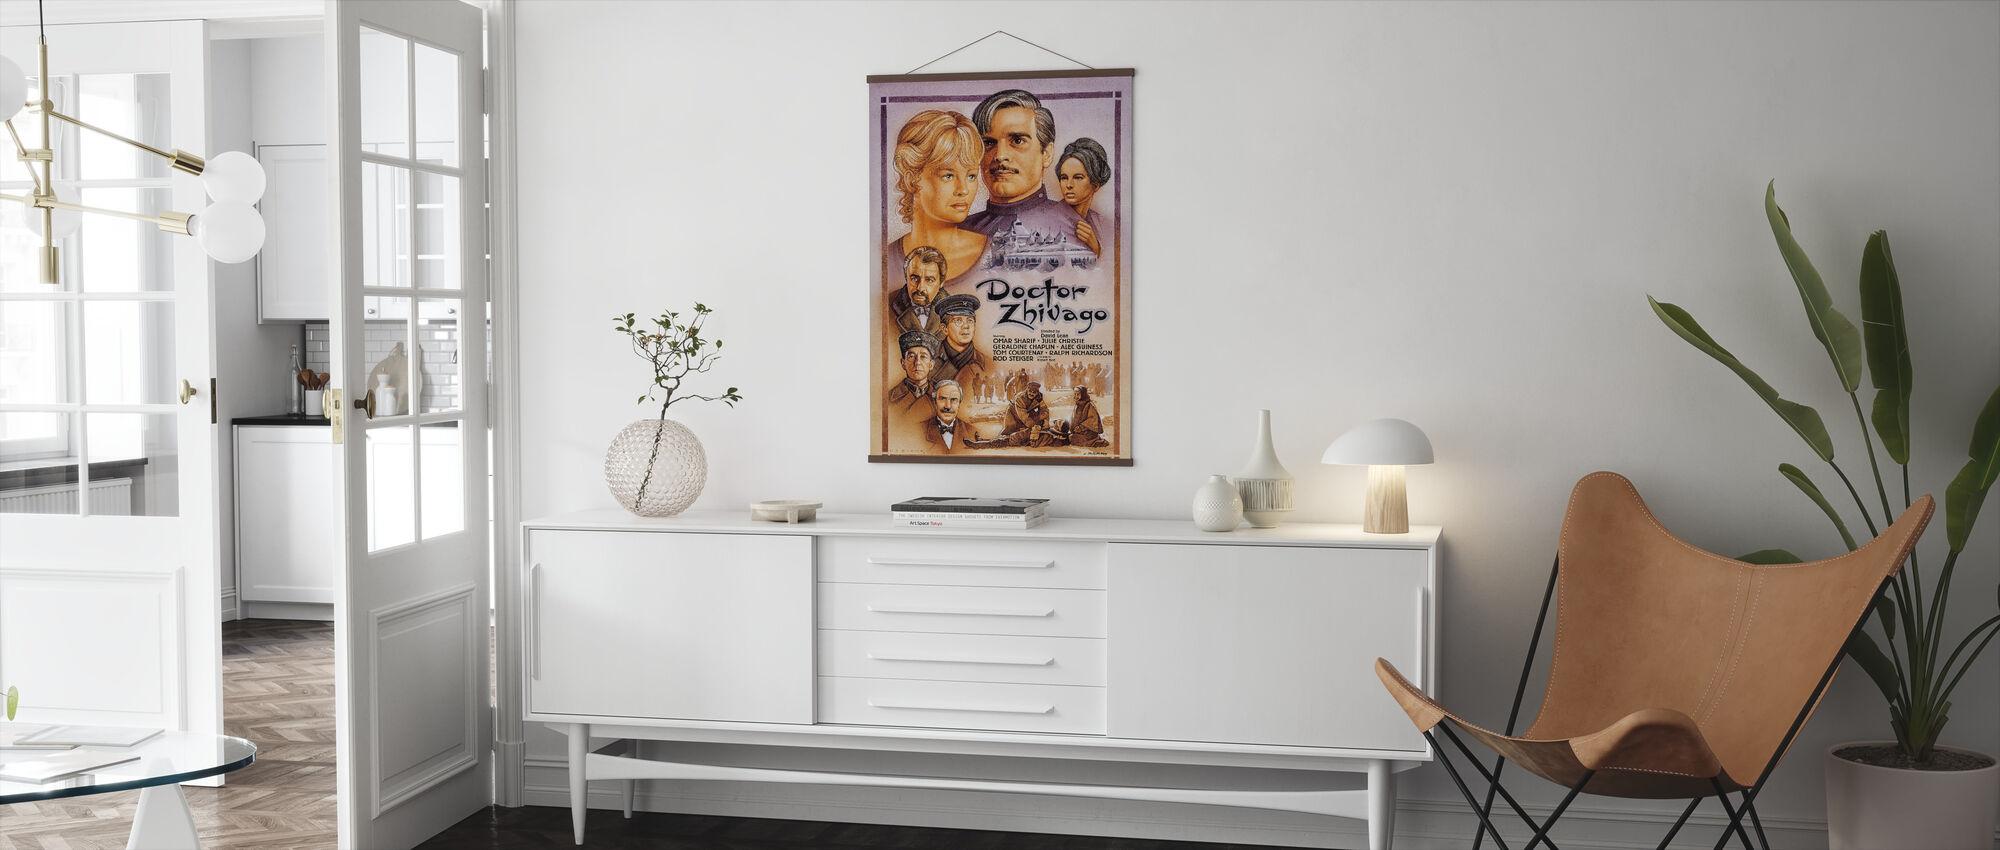 Doctor Zhivago - Poster - Living Room